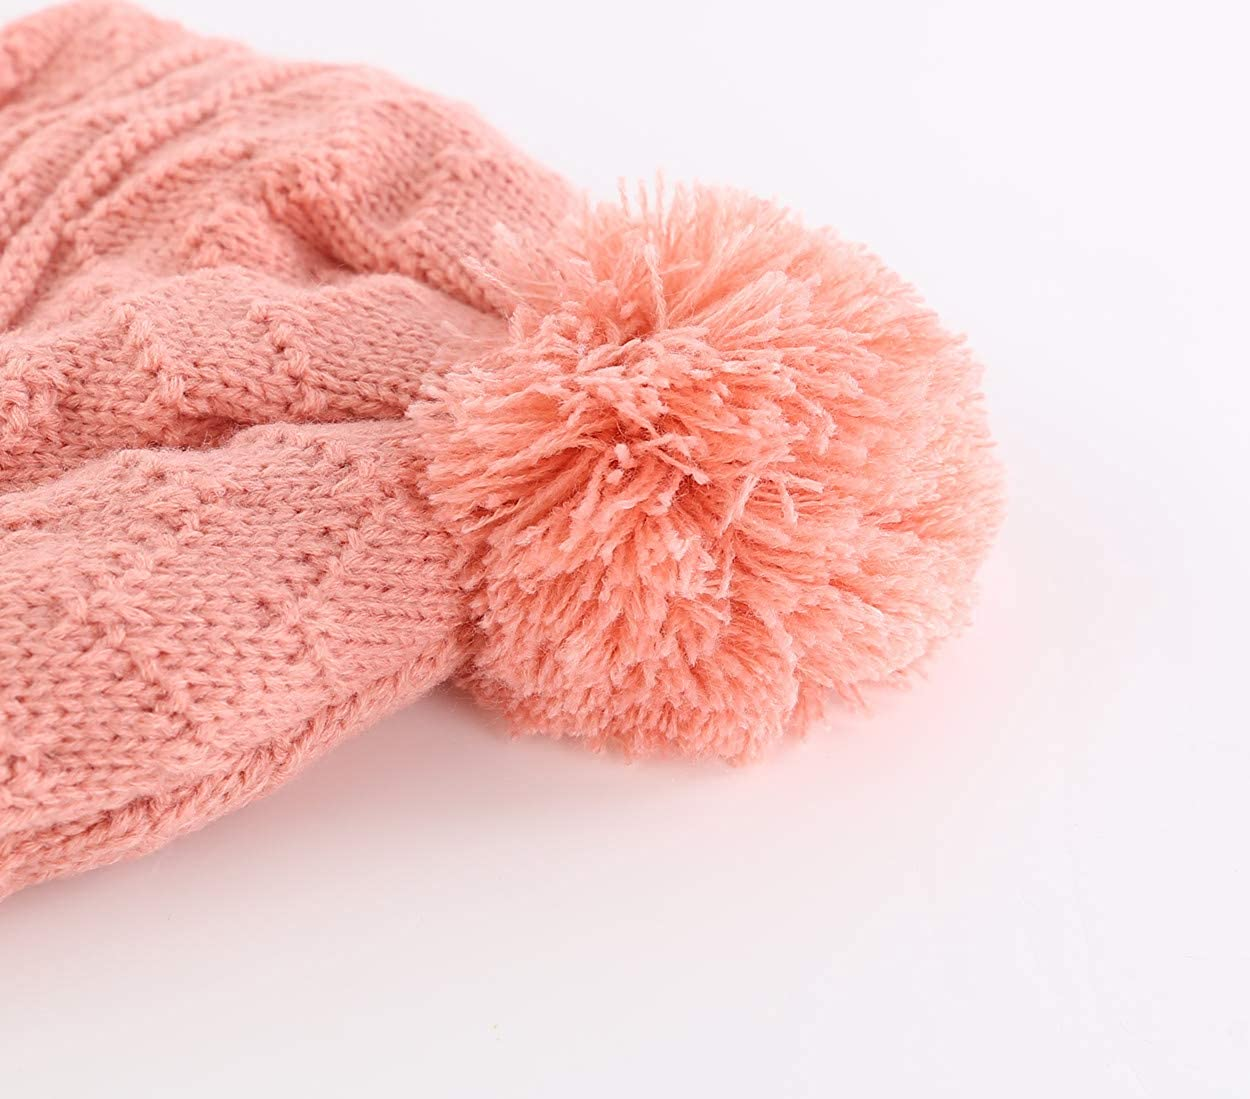 Magracy Baby Toddler Warm Earflap Beanie Kids Boys Girls Winter Fleece Lined Knitted Hat